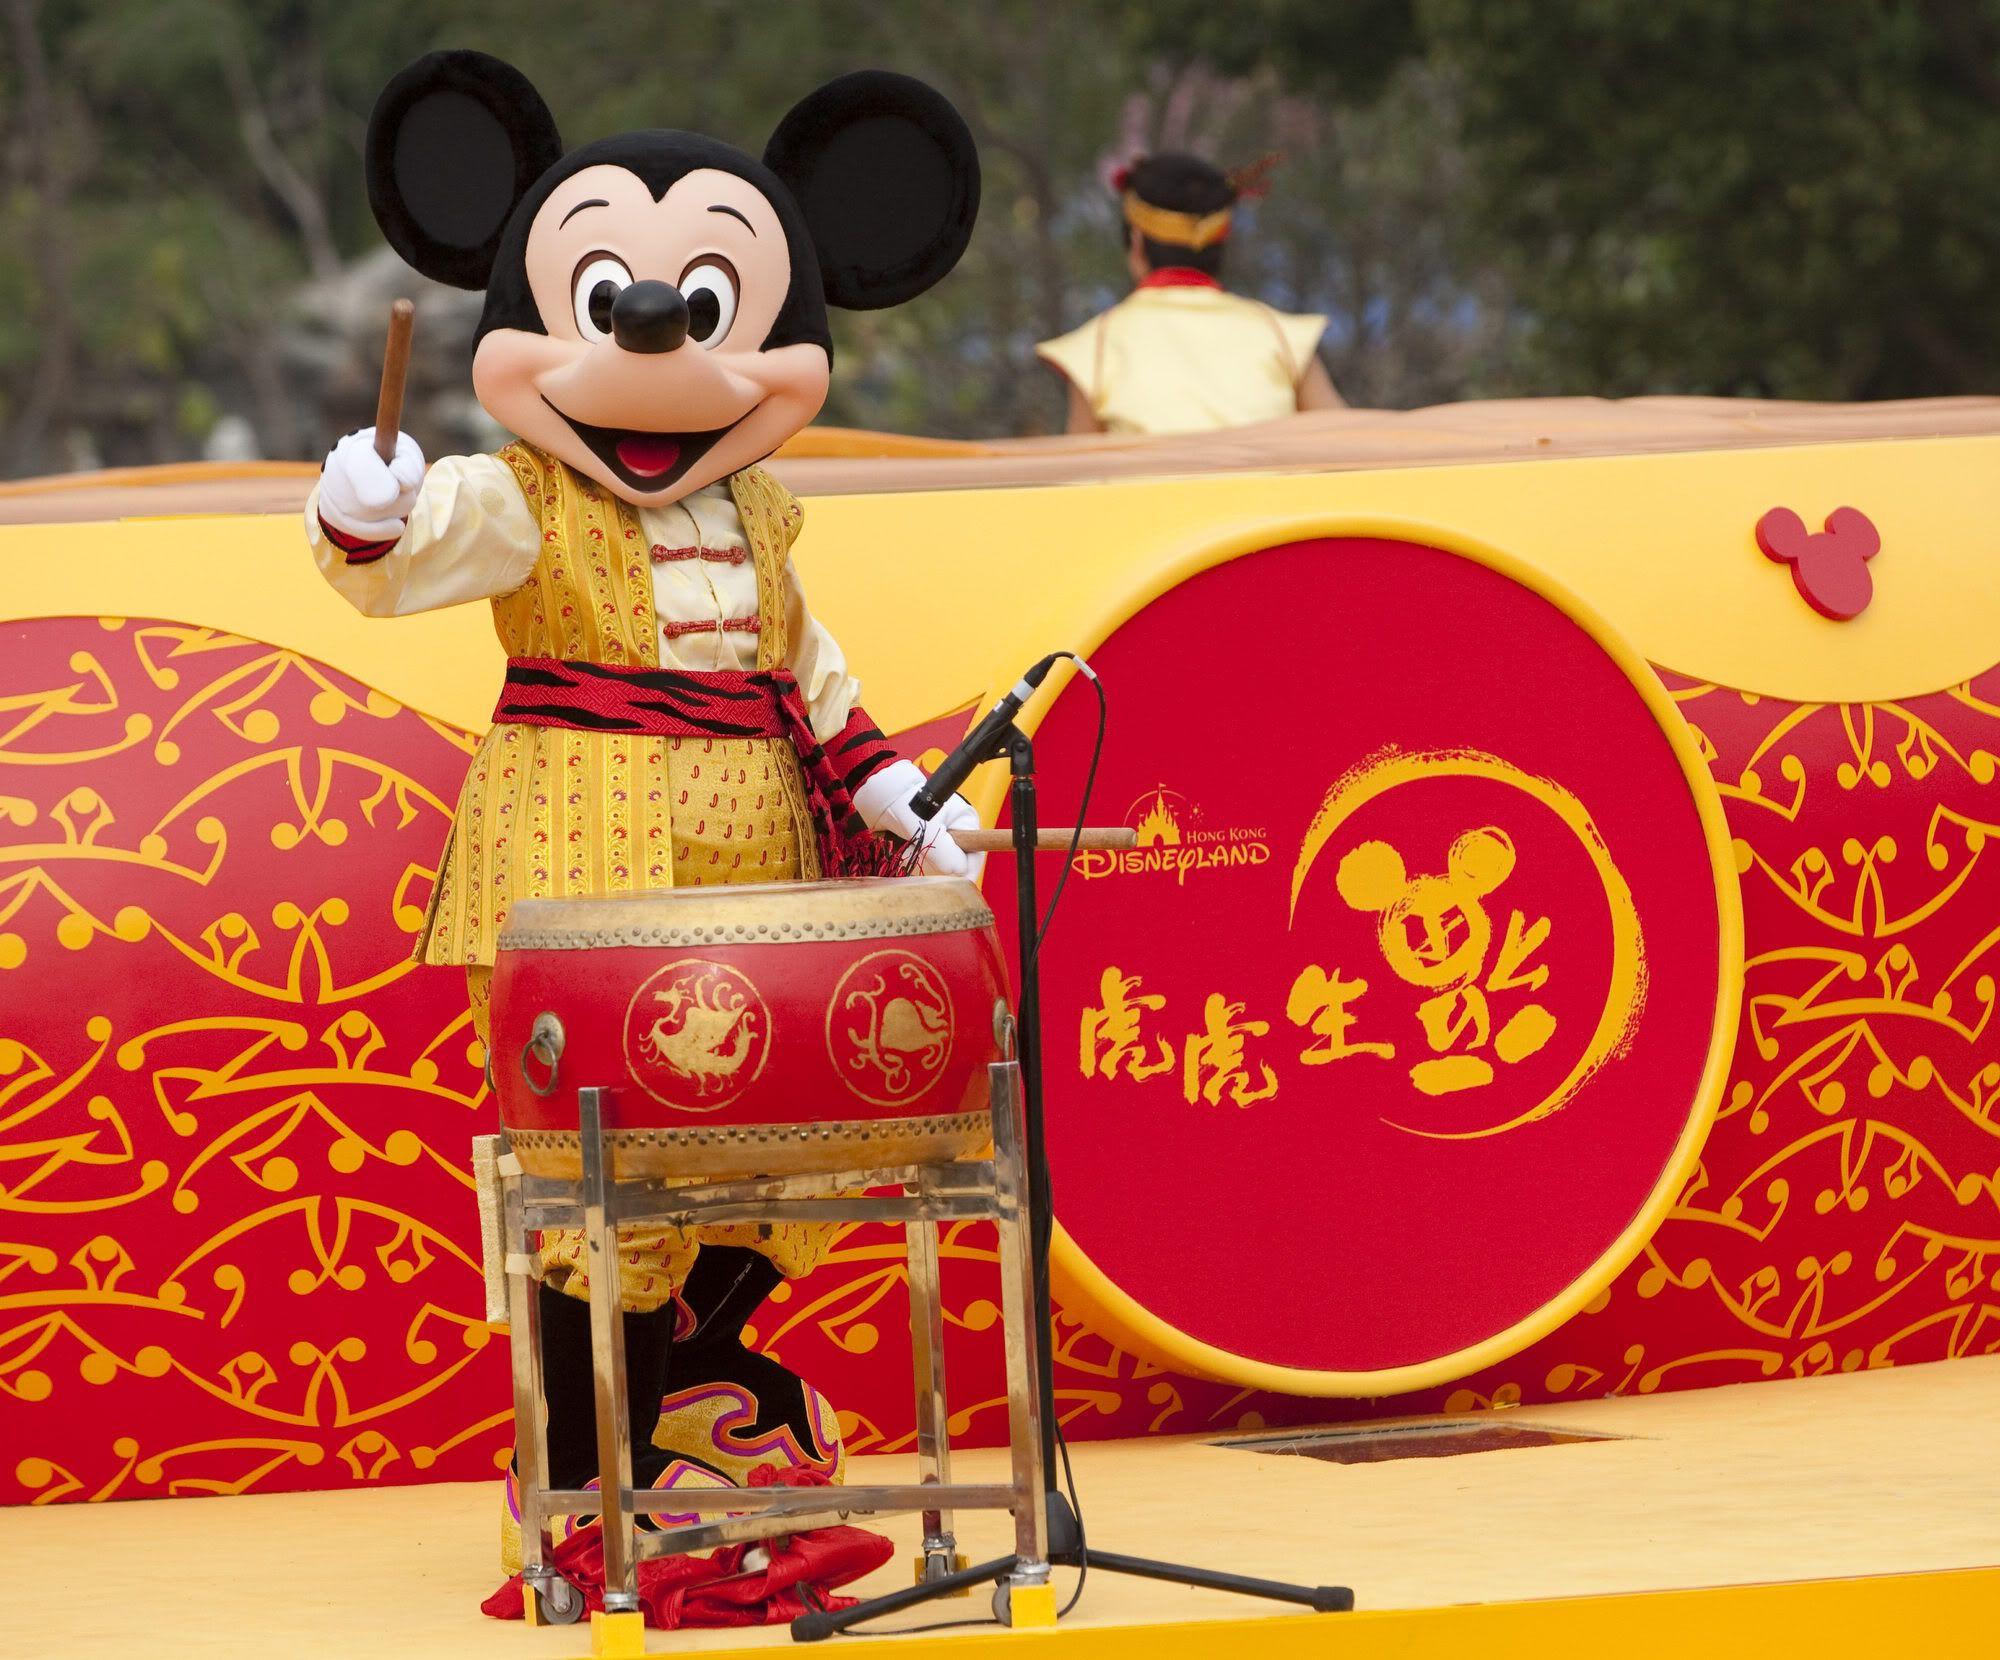 Drum Rolls Begin At Hong Kong Disneyland For The Chinese New Year S Celebration Hong Kong Disneyland Disneyland Disney Theme Parks